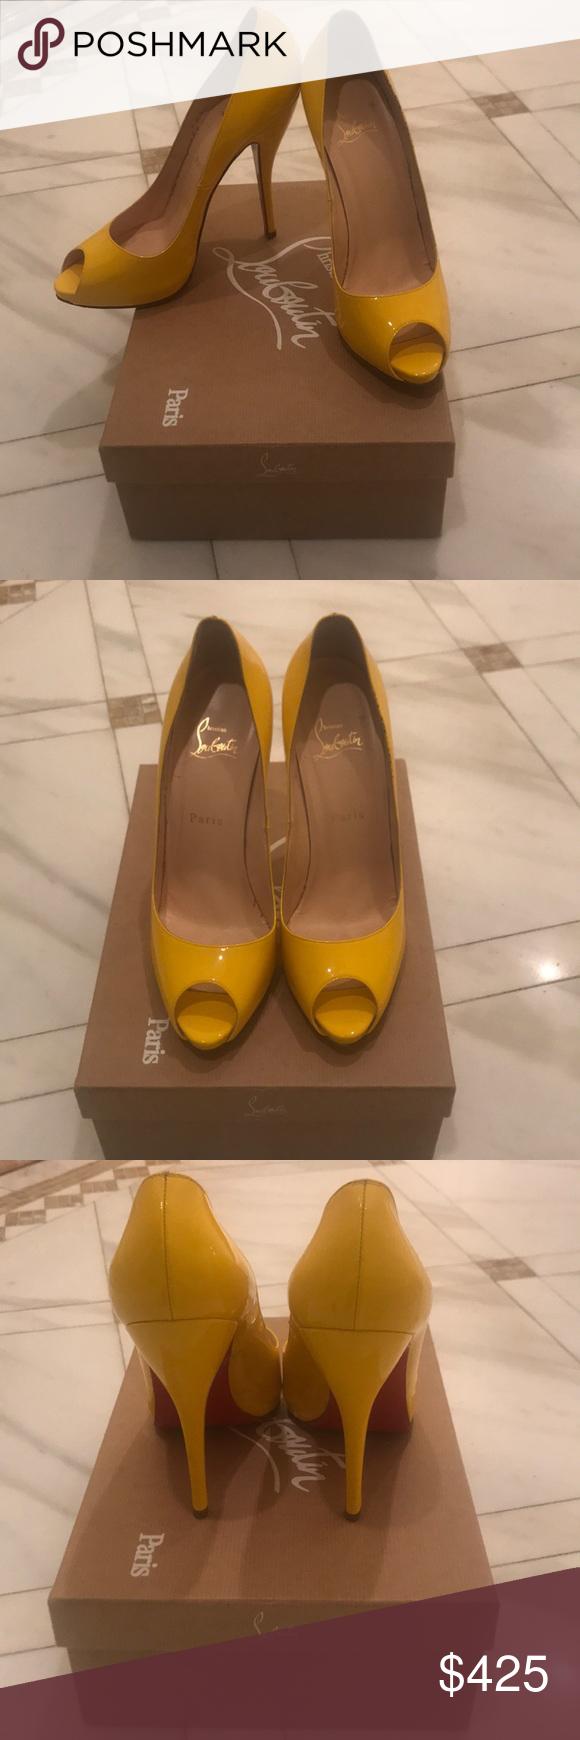 c2c70c99367 Christian Louboutin Yellow Patent Leather Peep-Toe Twice ever worn ...